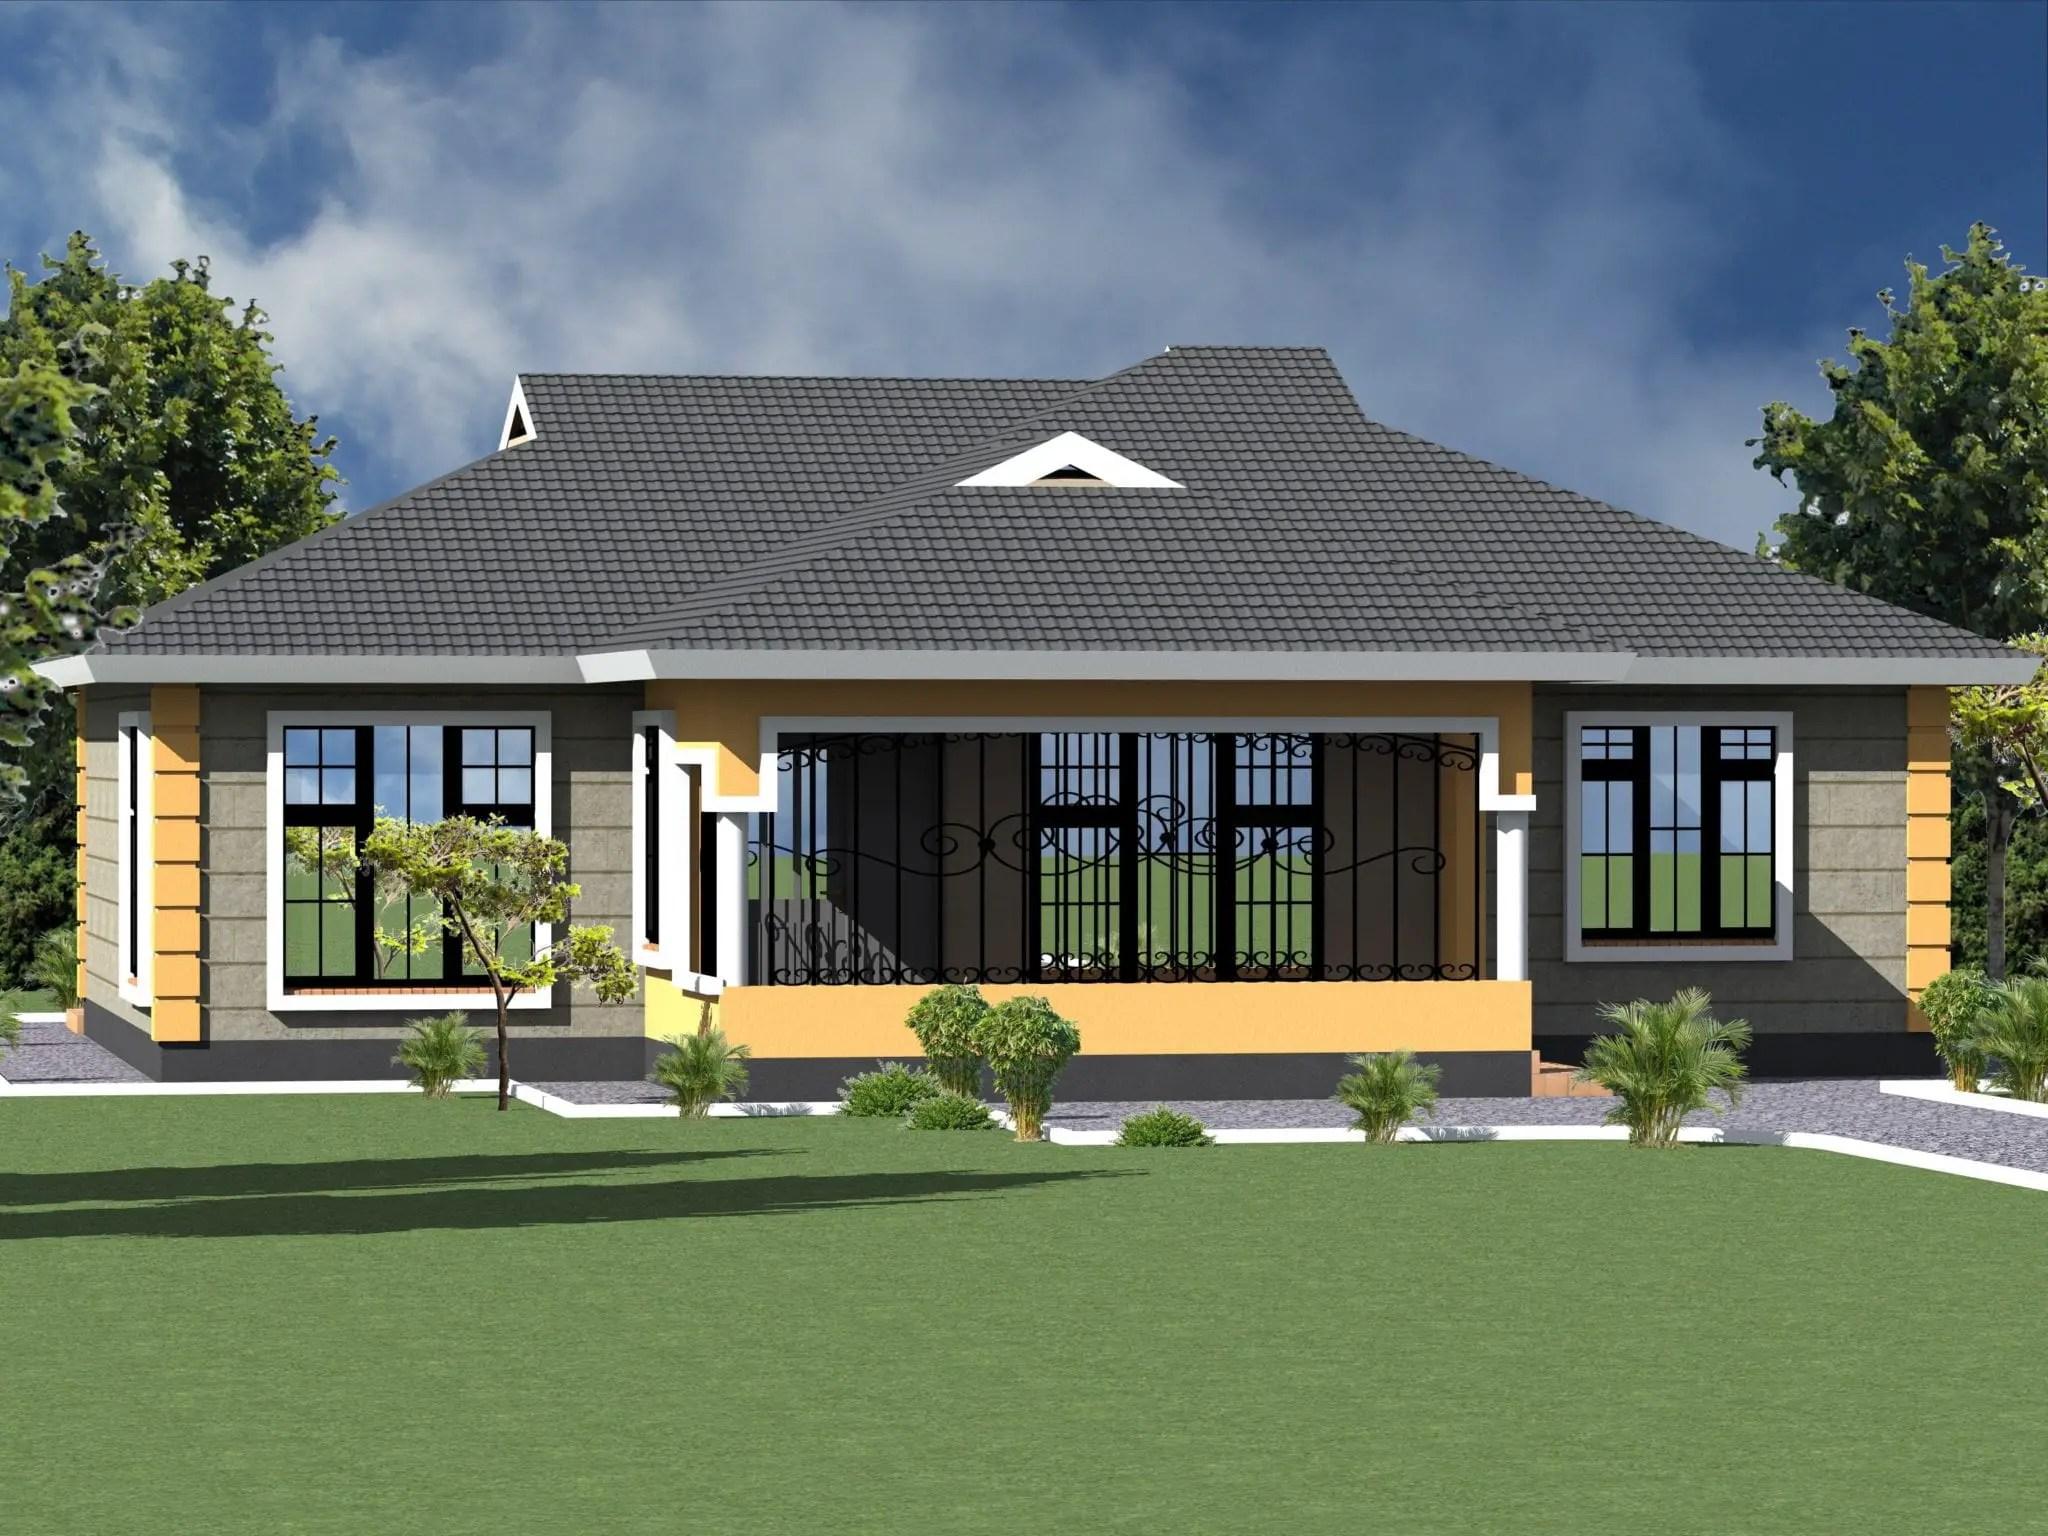 3 Bedroom Bungalow House Plan Design Hpd Consult